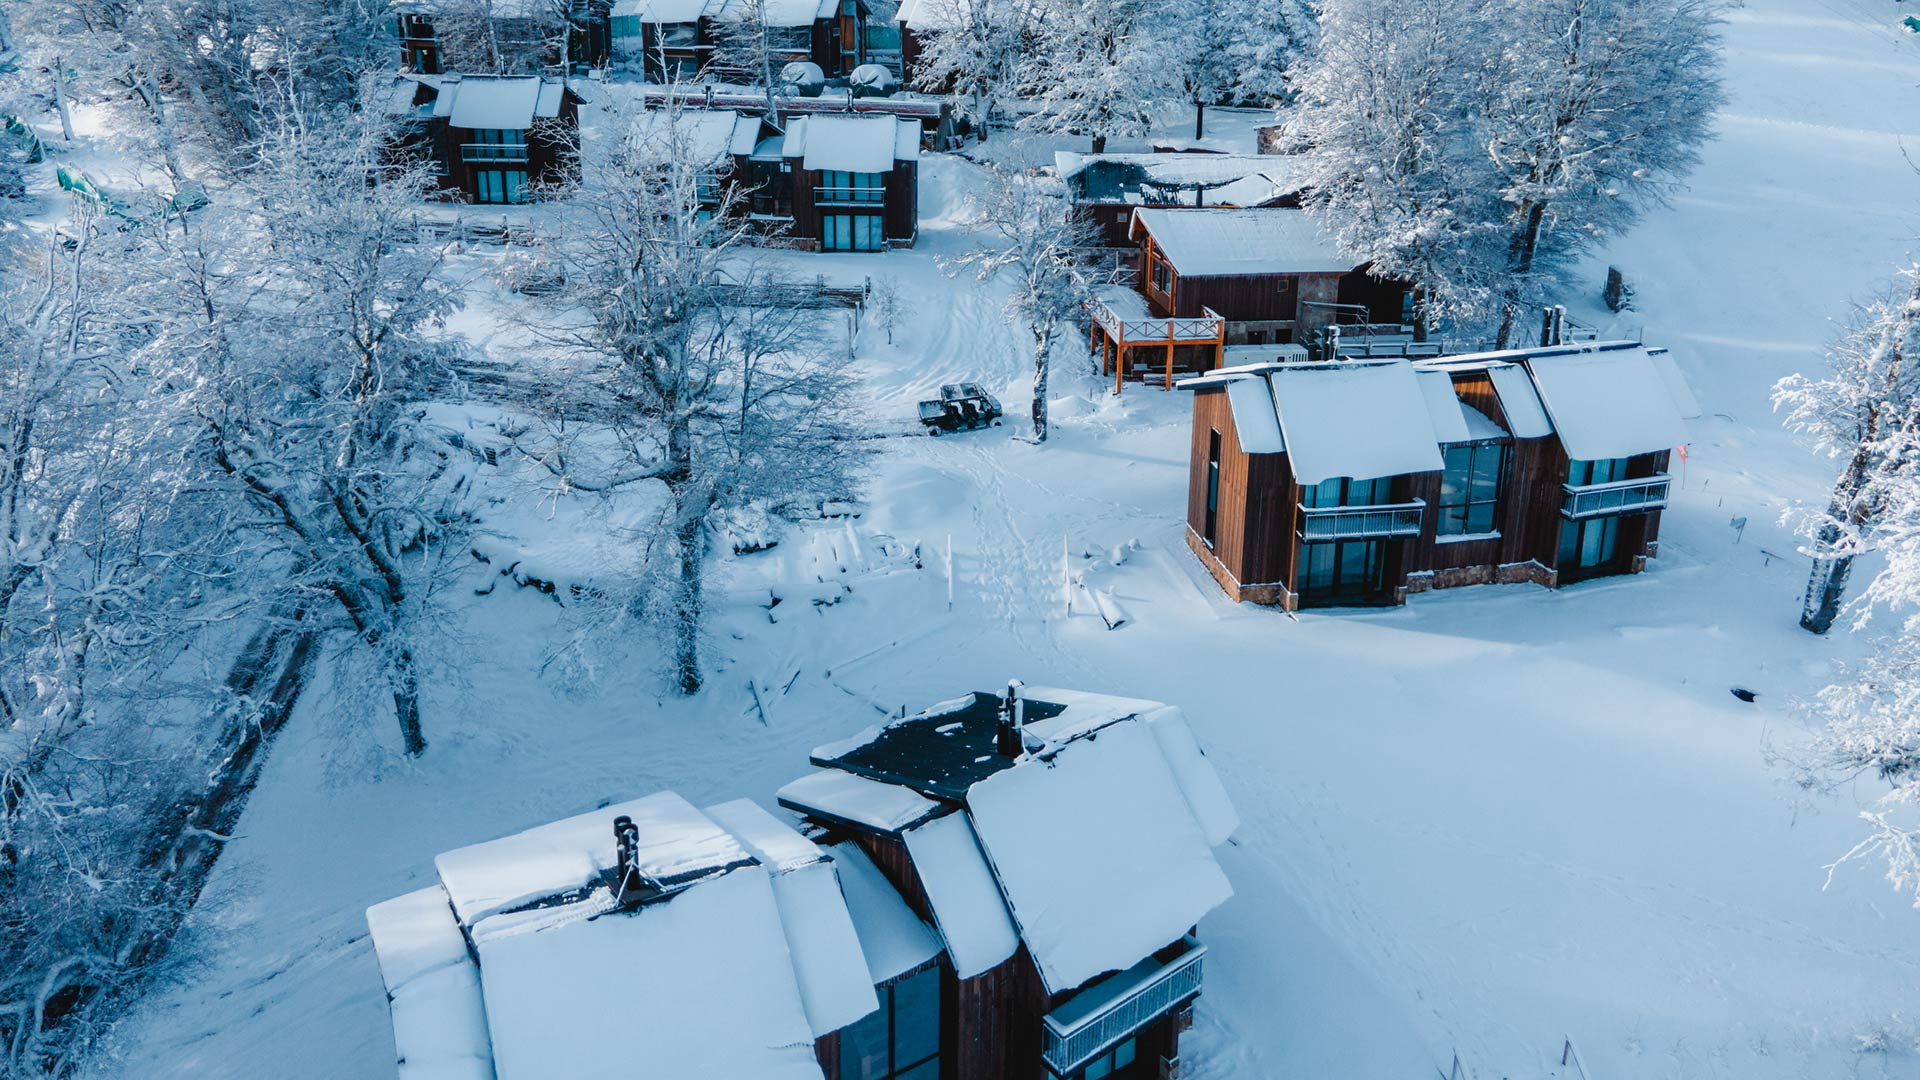 centro de ski